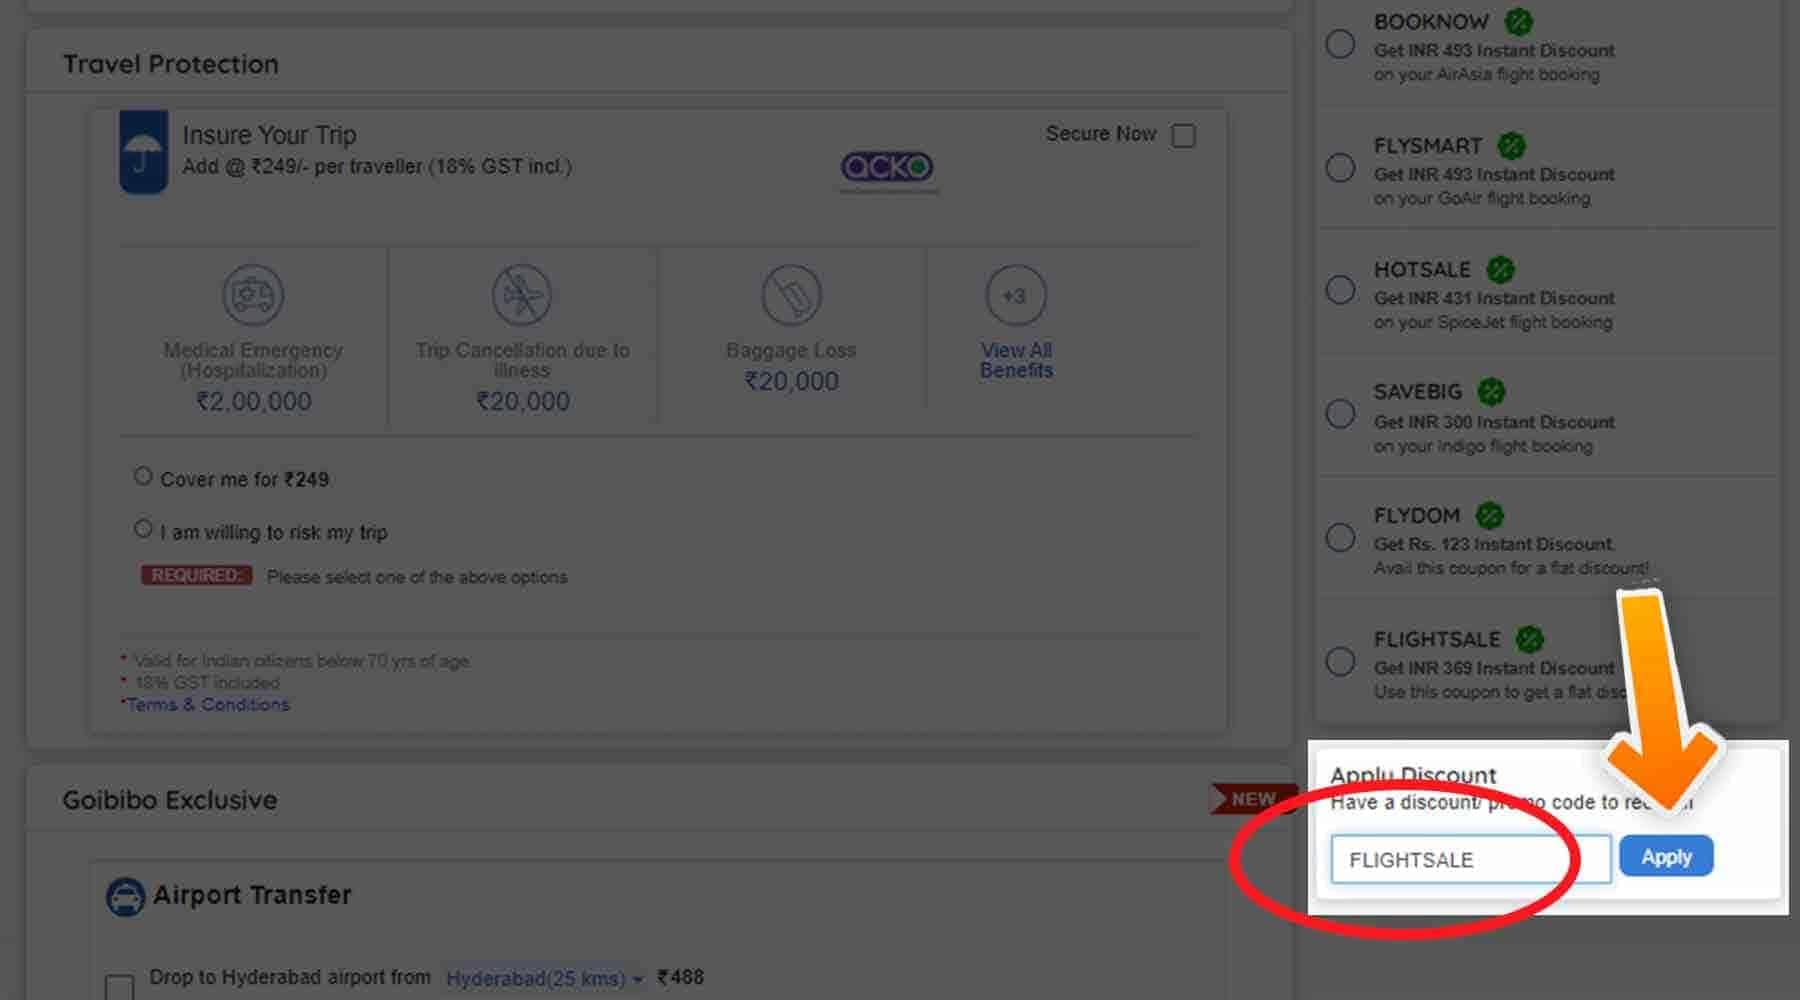 How to use Goibibo Discount code